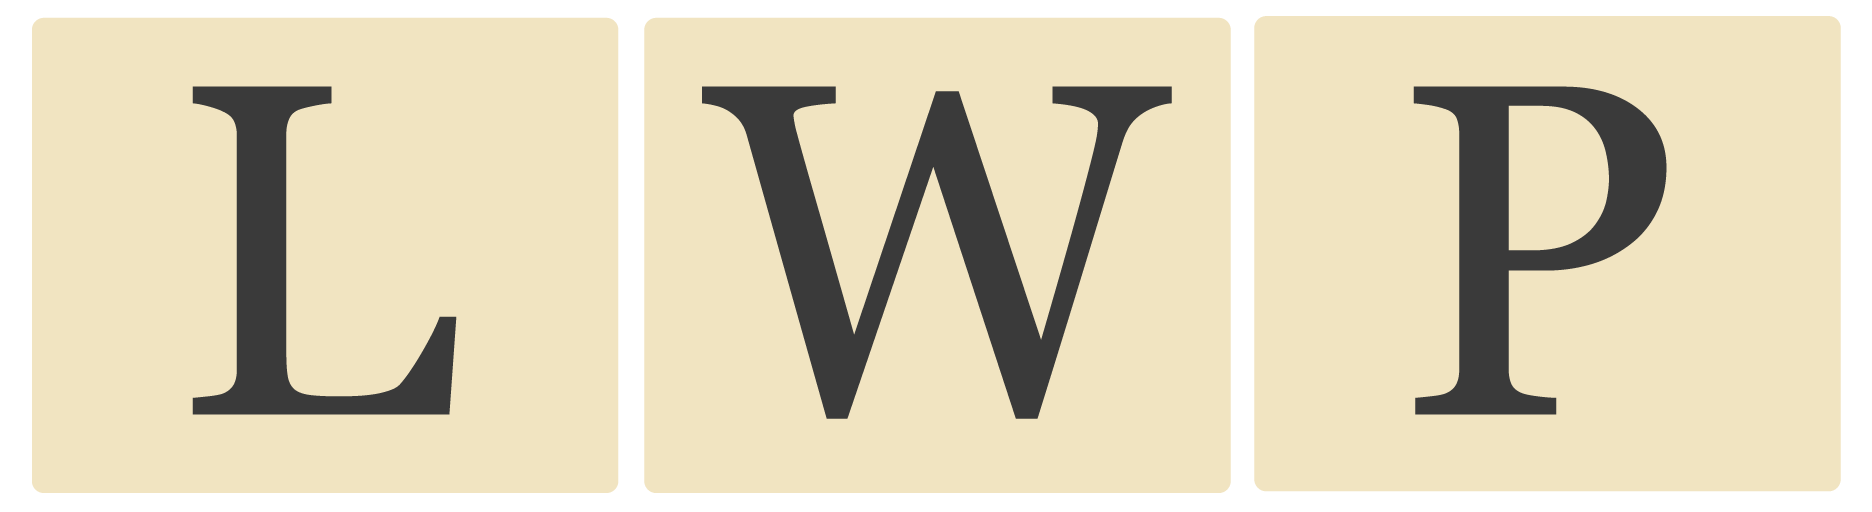 LWP -- Linked Women Pedagogues